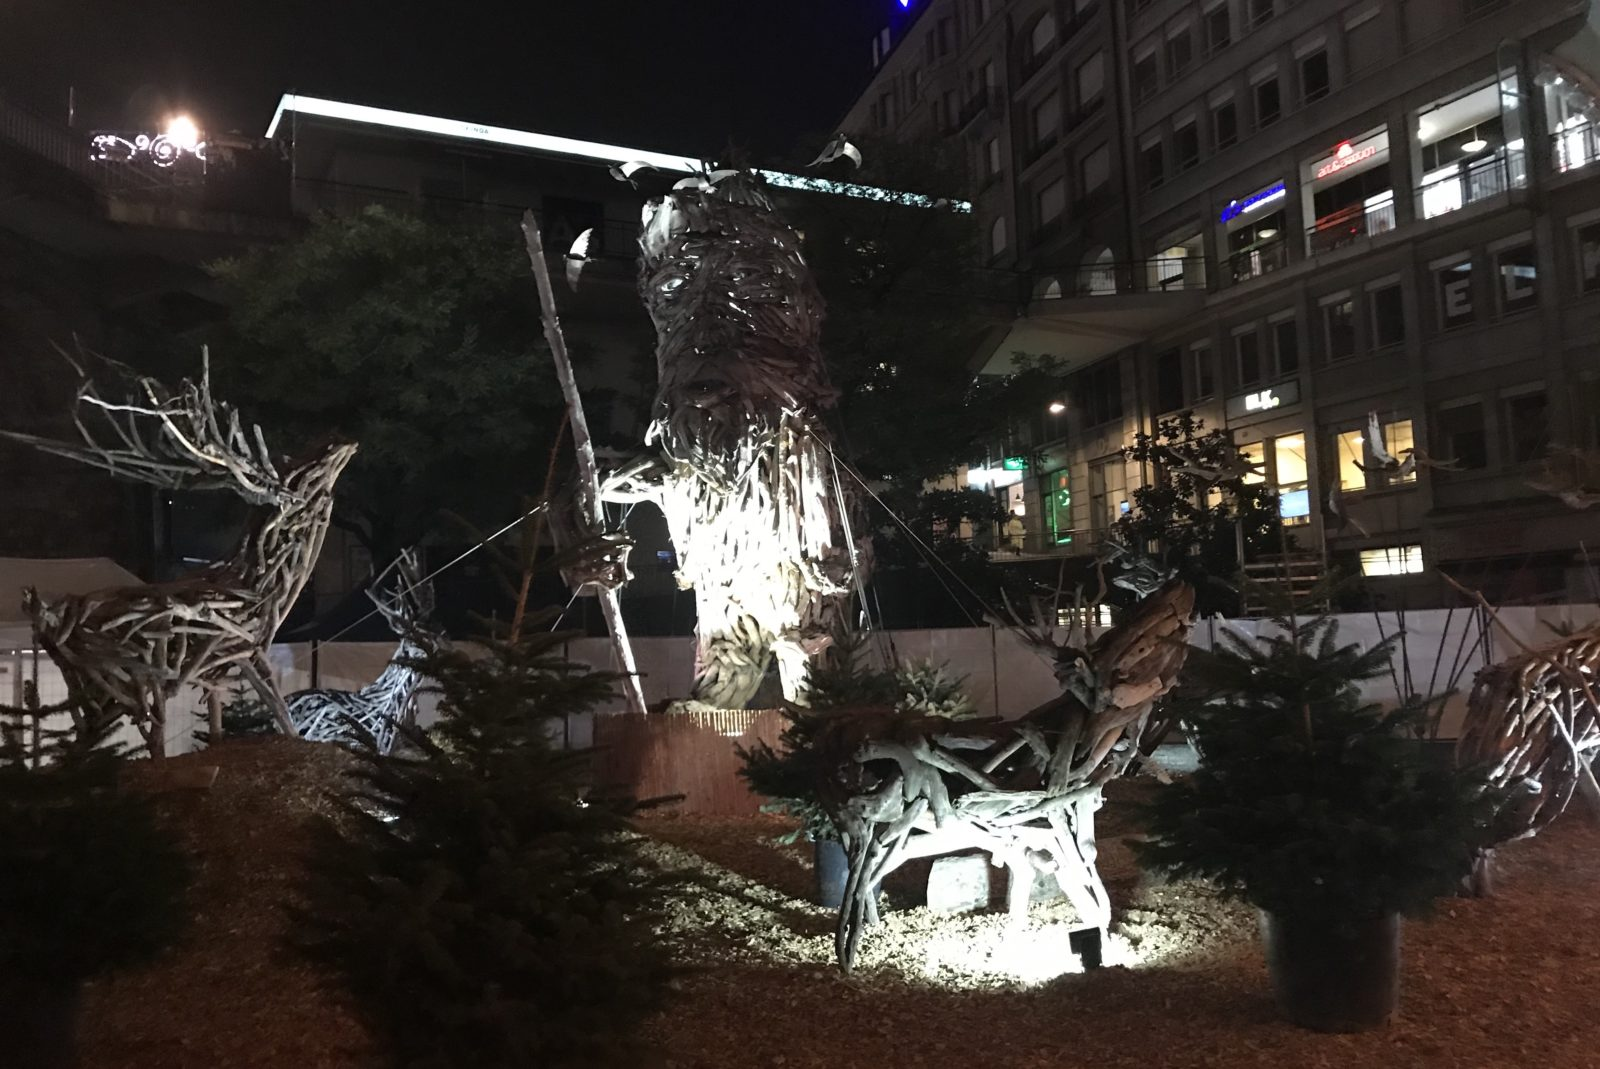 Bô Noël 2019 les Flottins